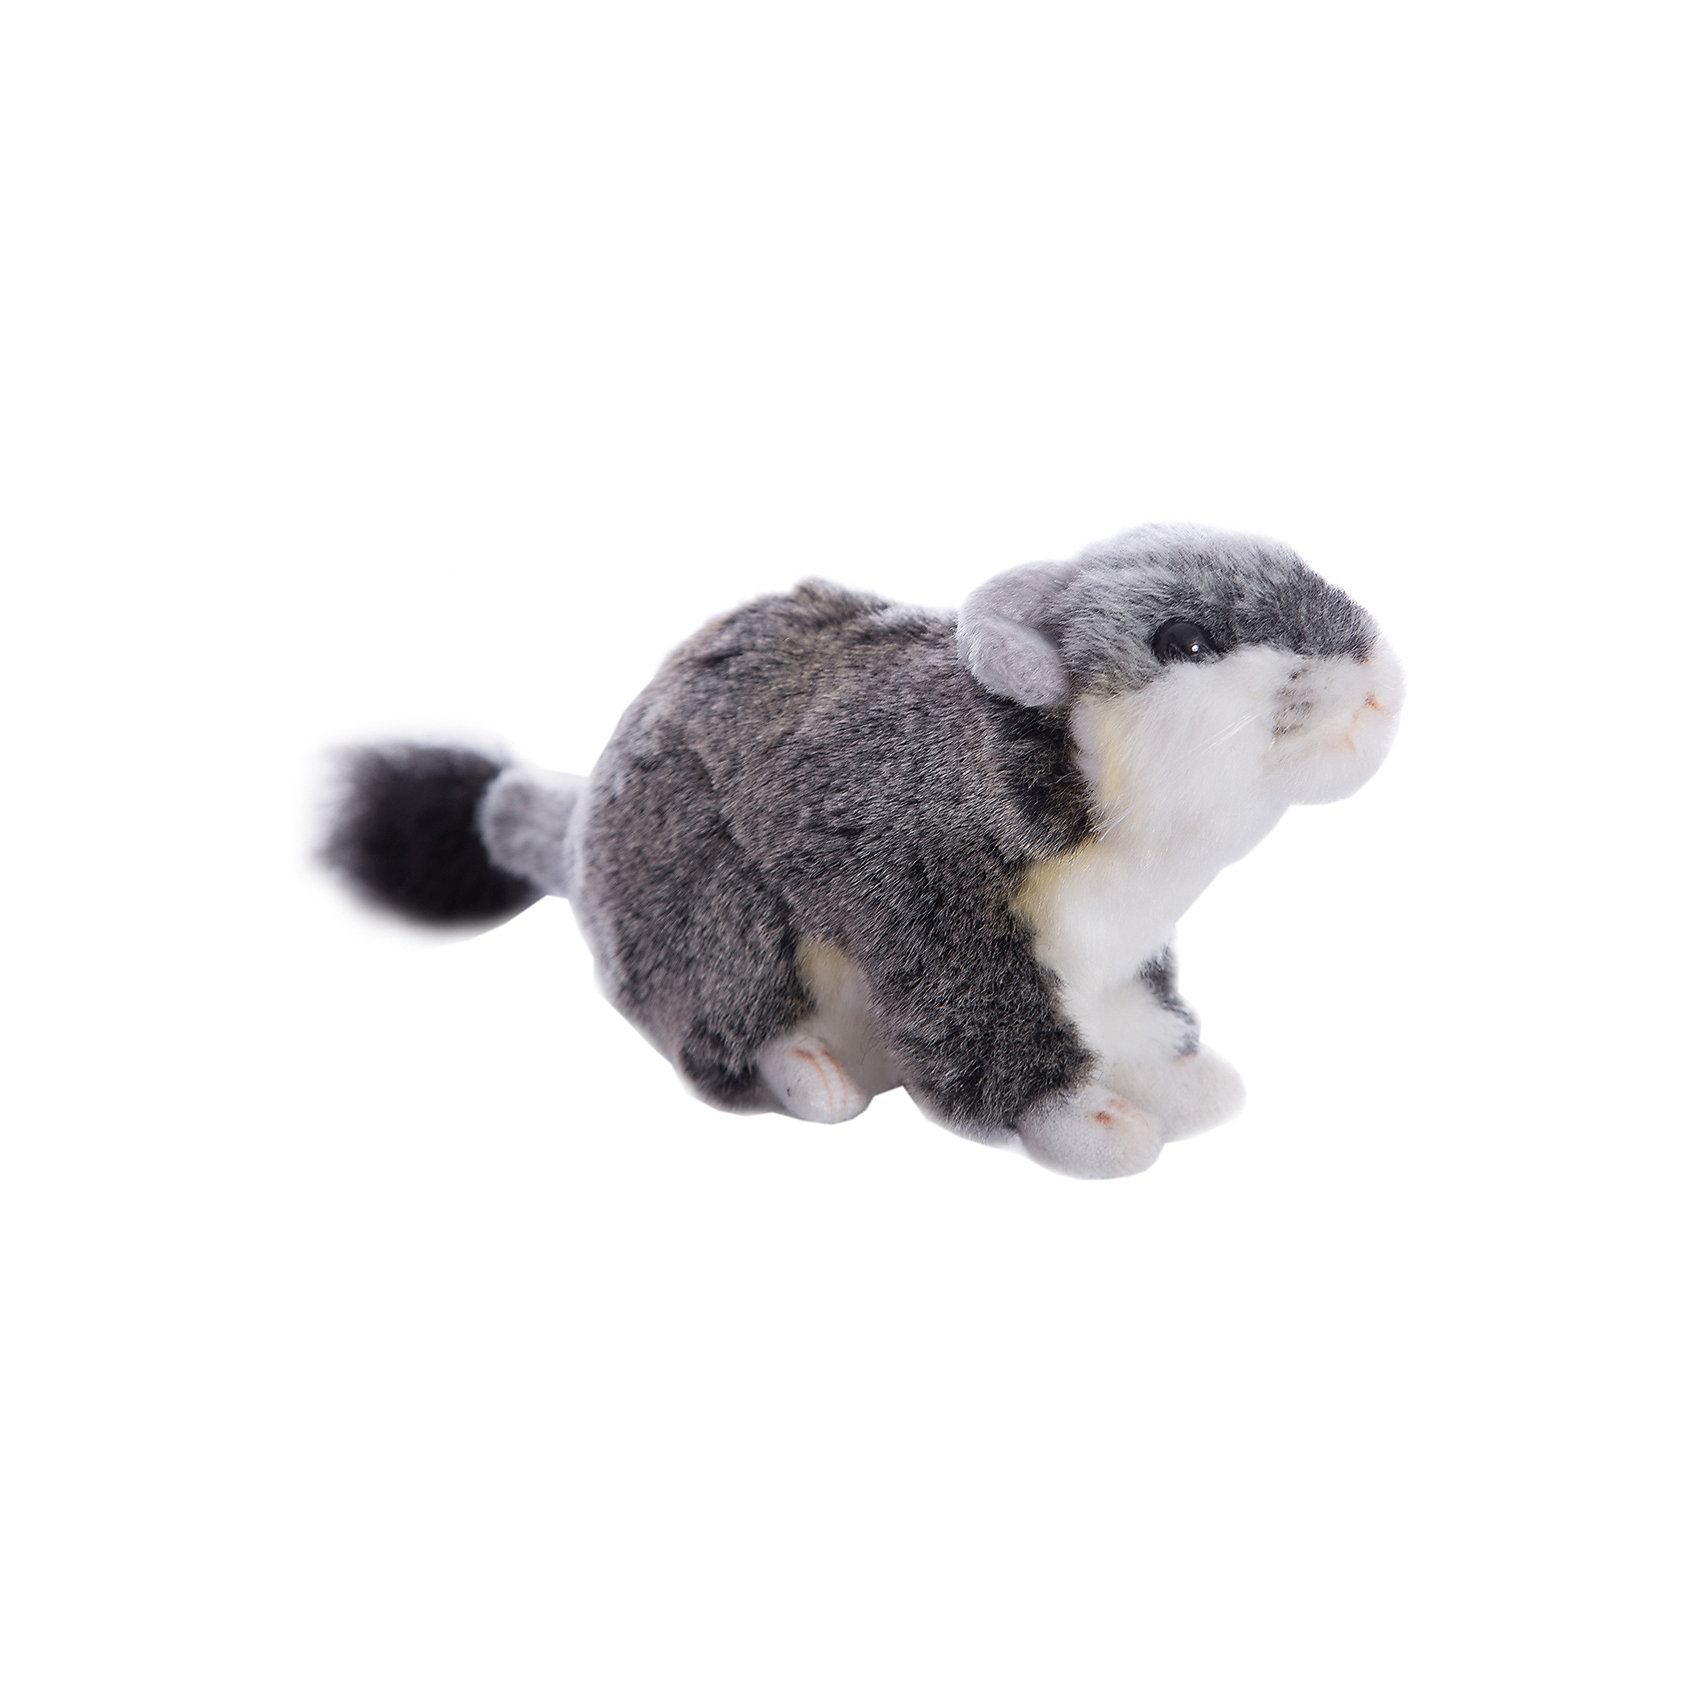 Хомячок джунгарский, 12 см